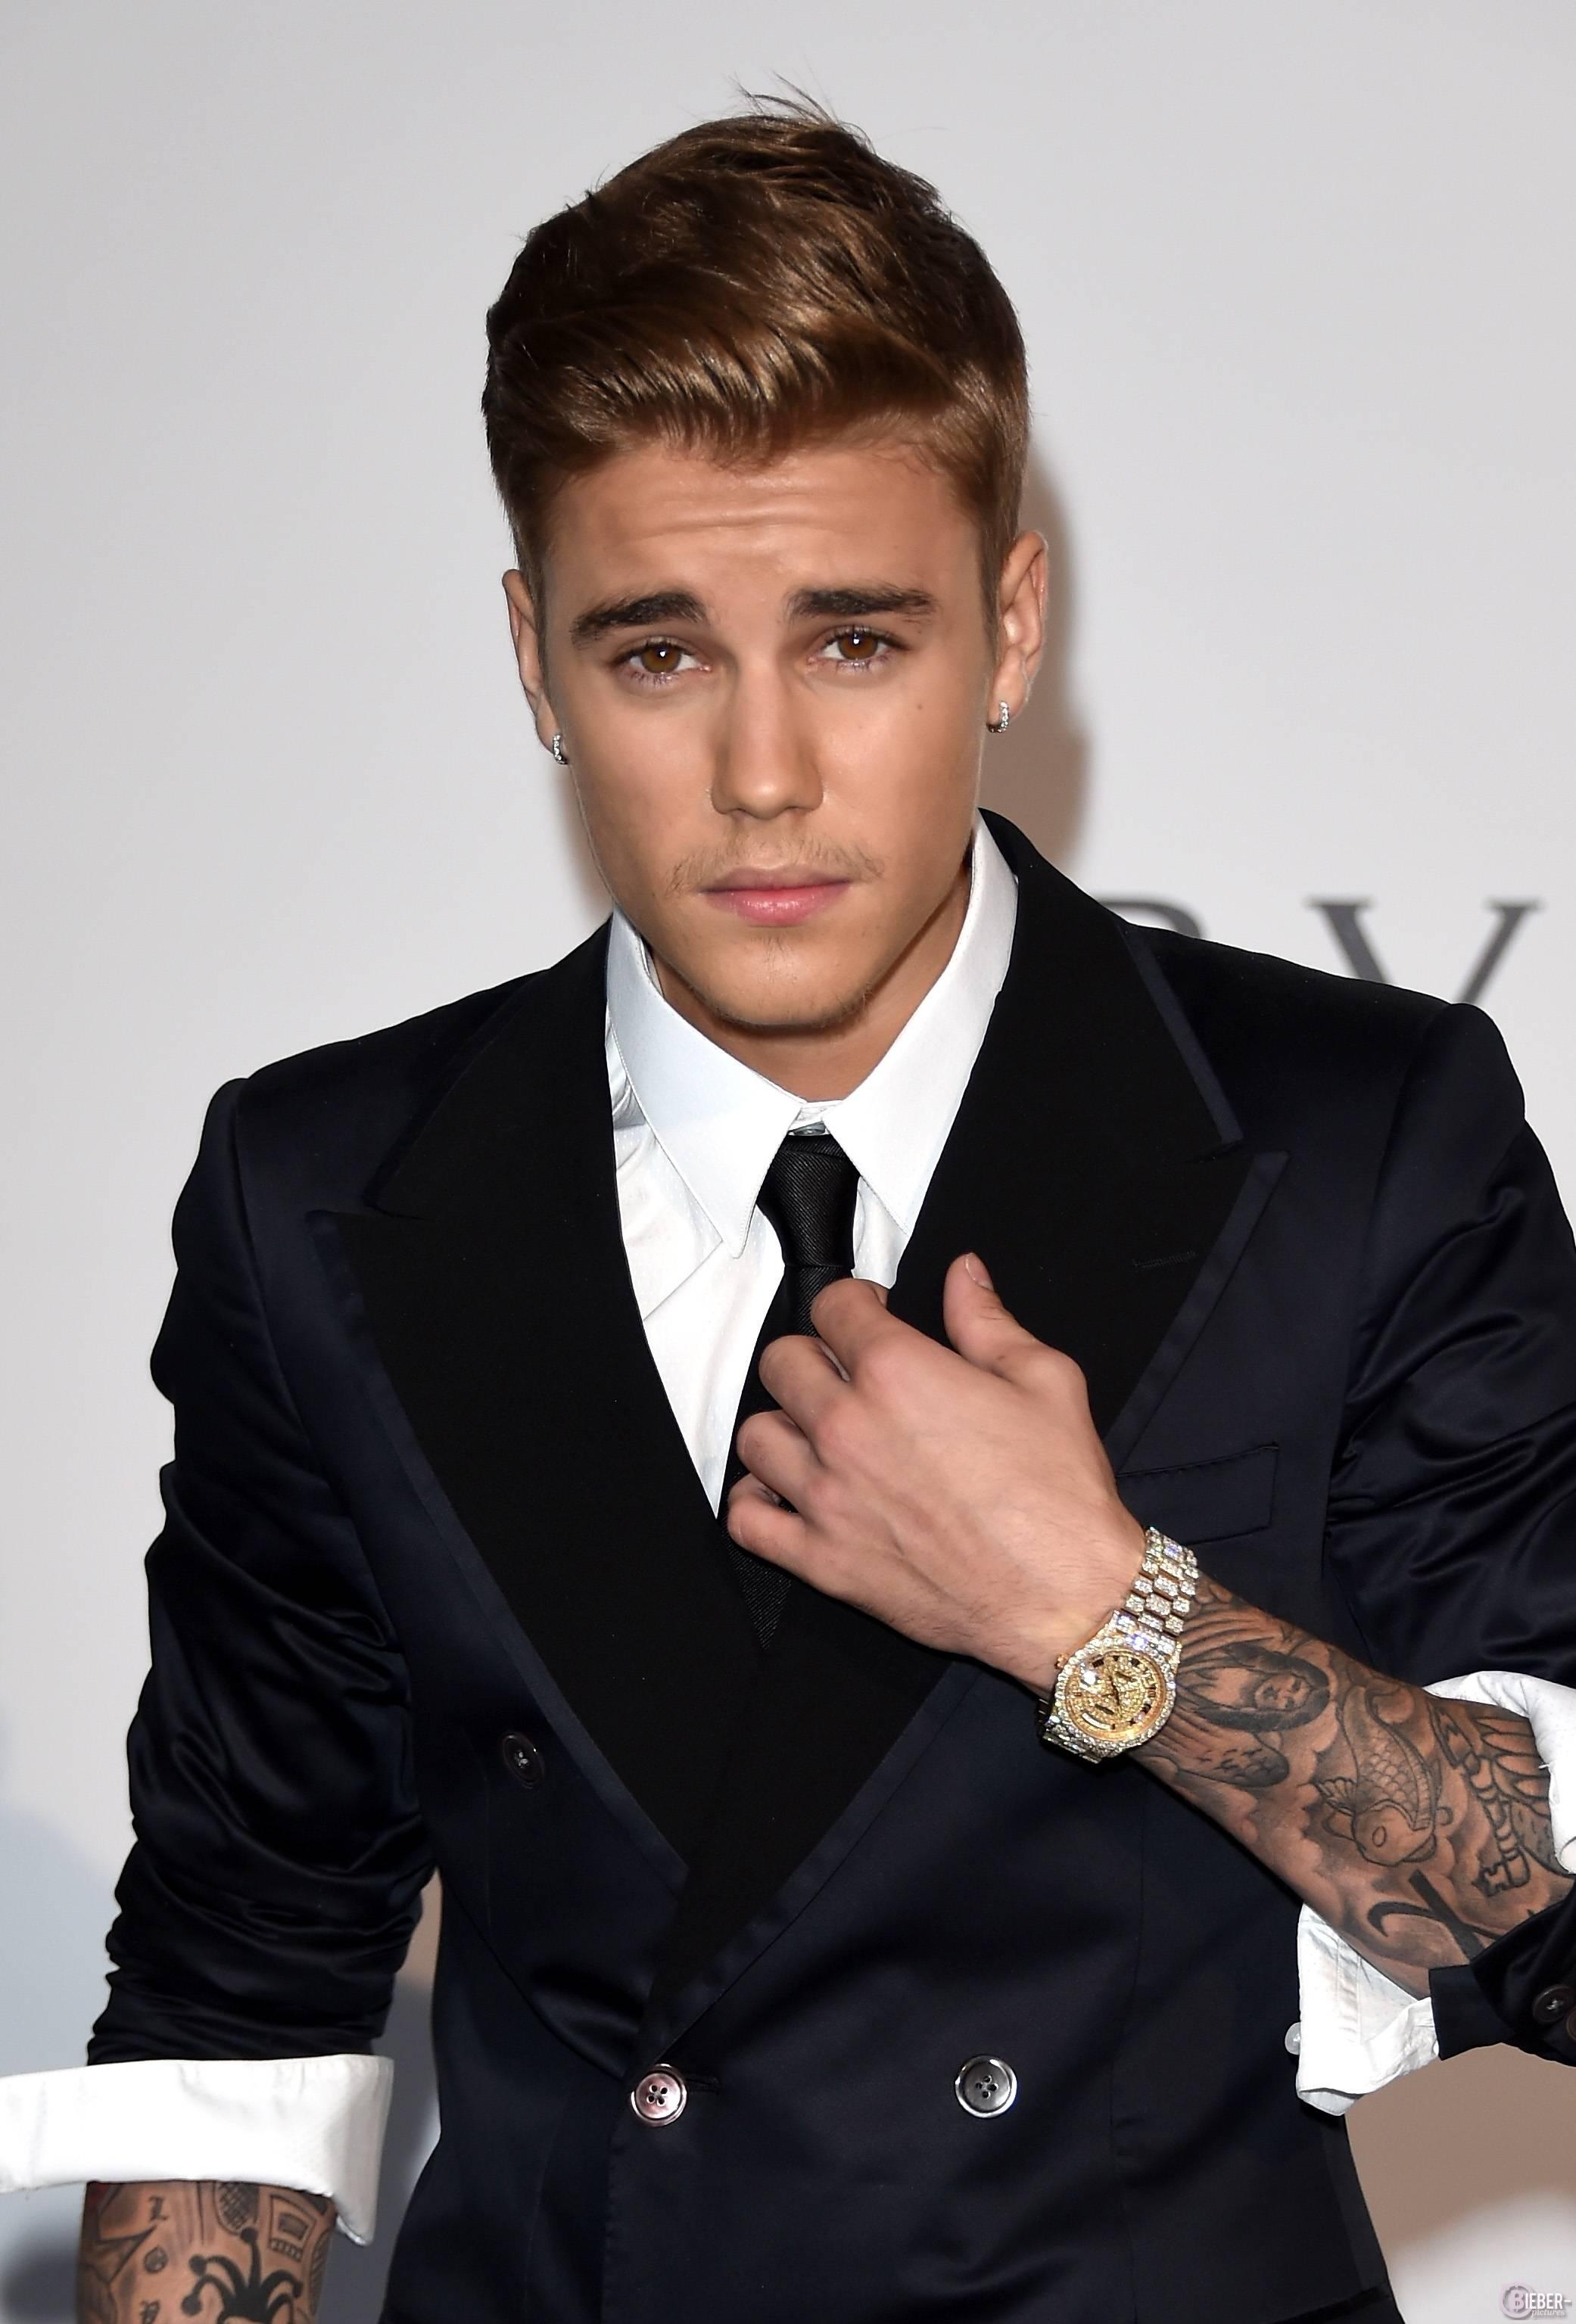 Justin Bieber Tumblr Backgrounds 2015 - Wallpaper Cave Justin Bieber